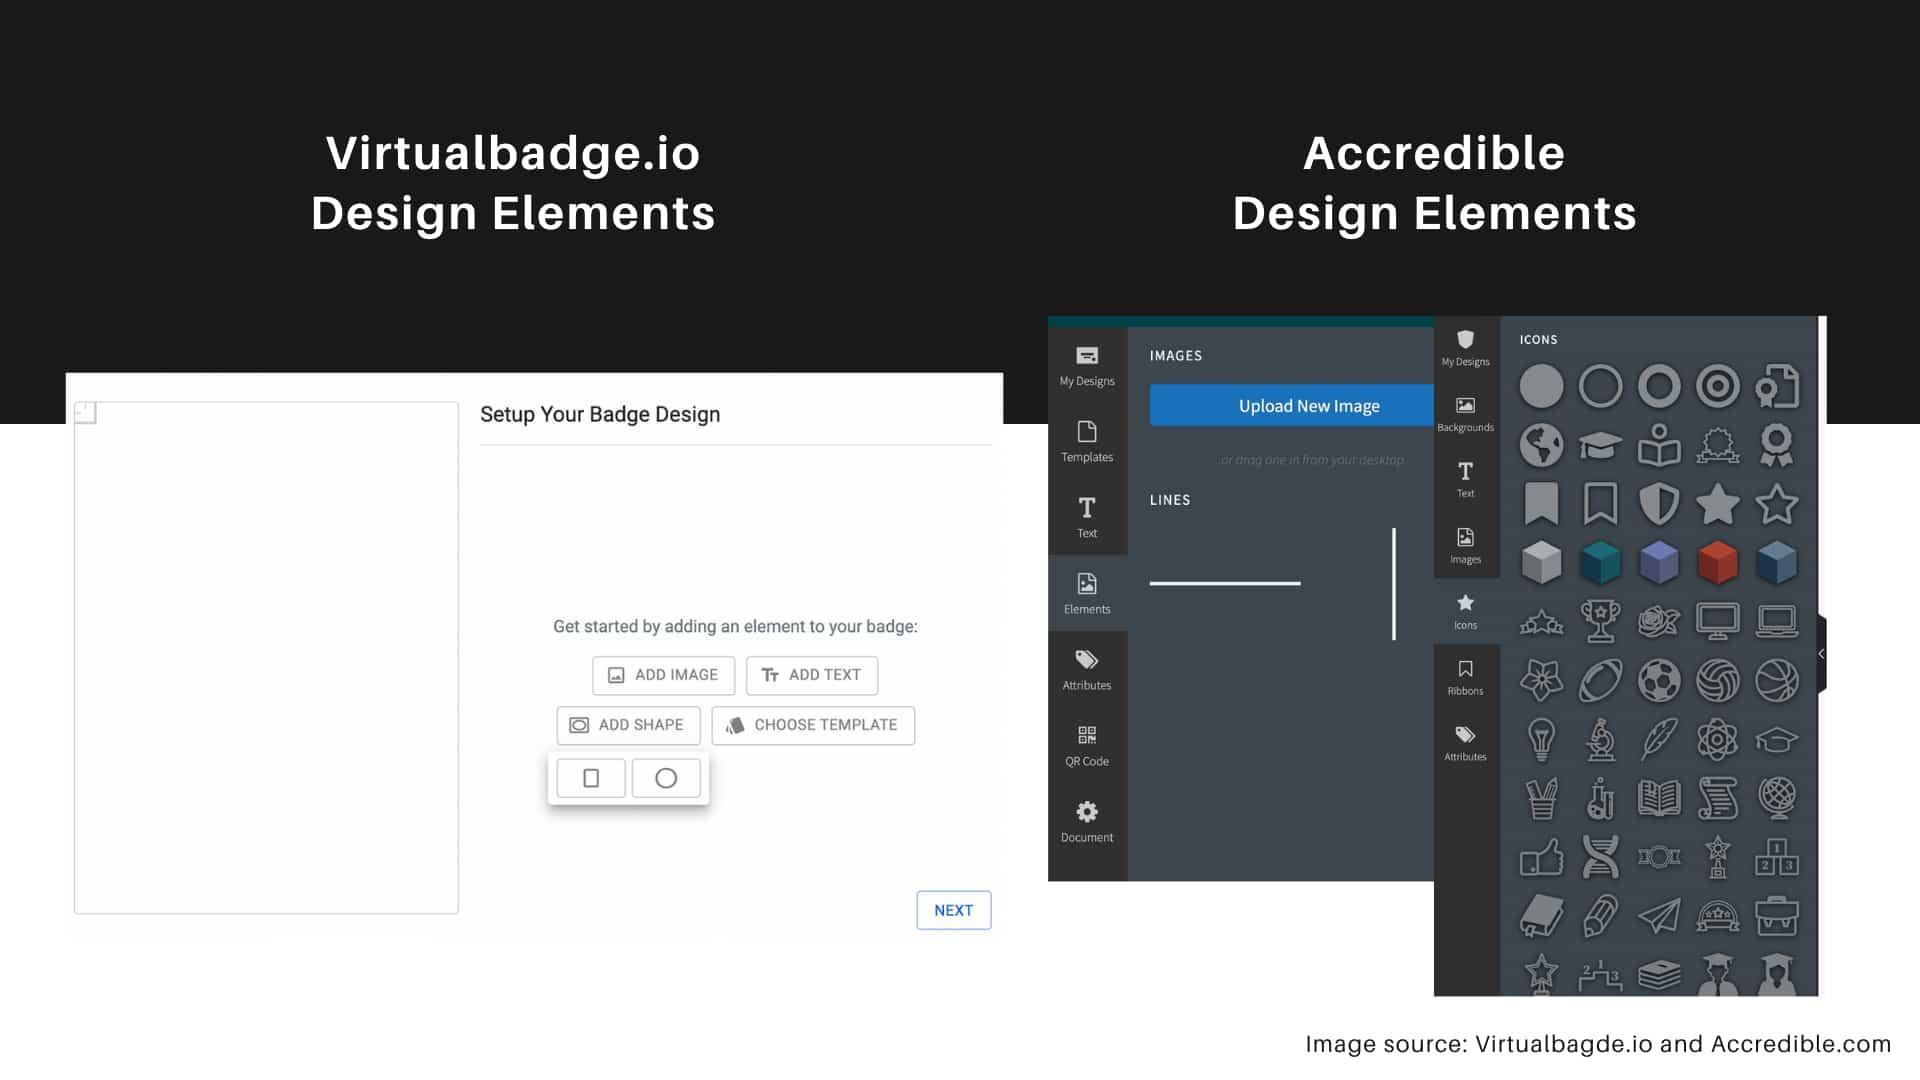 Virtualbadge.io vs. Accredible - design elements for the software